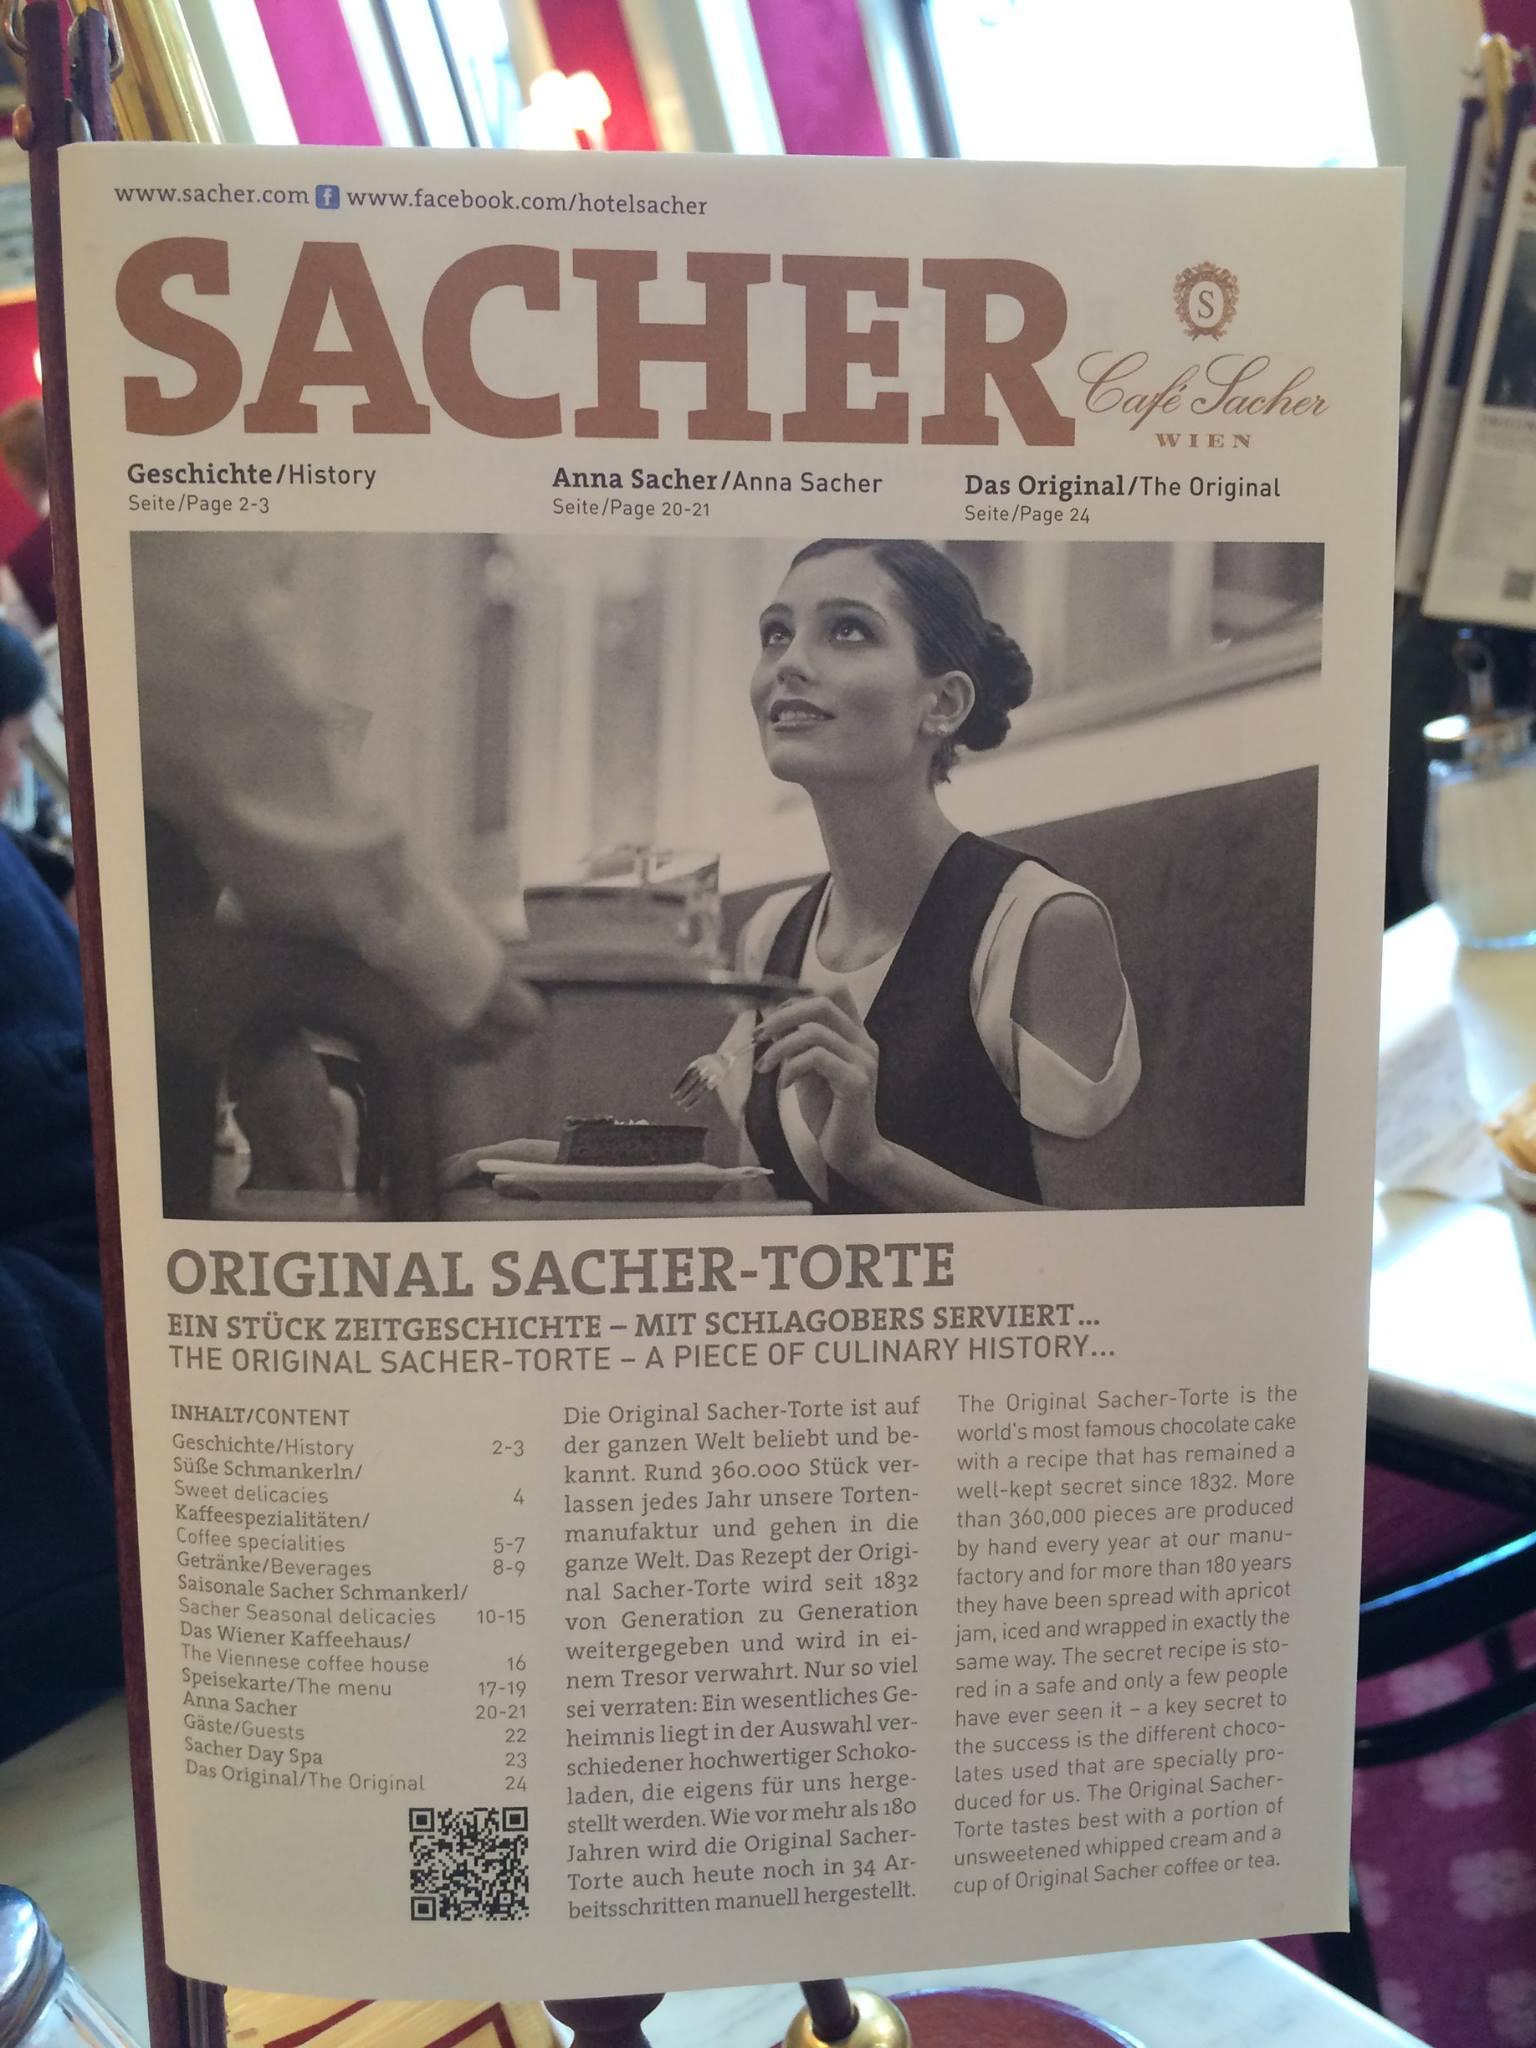 Sacher menu in the cafe